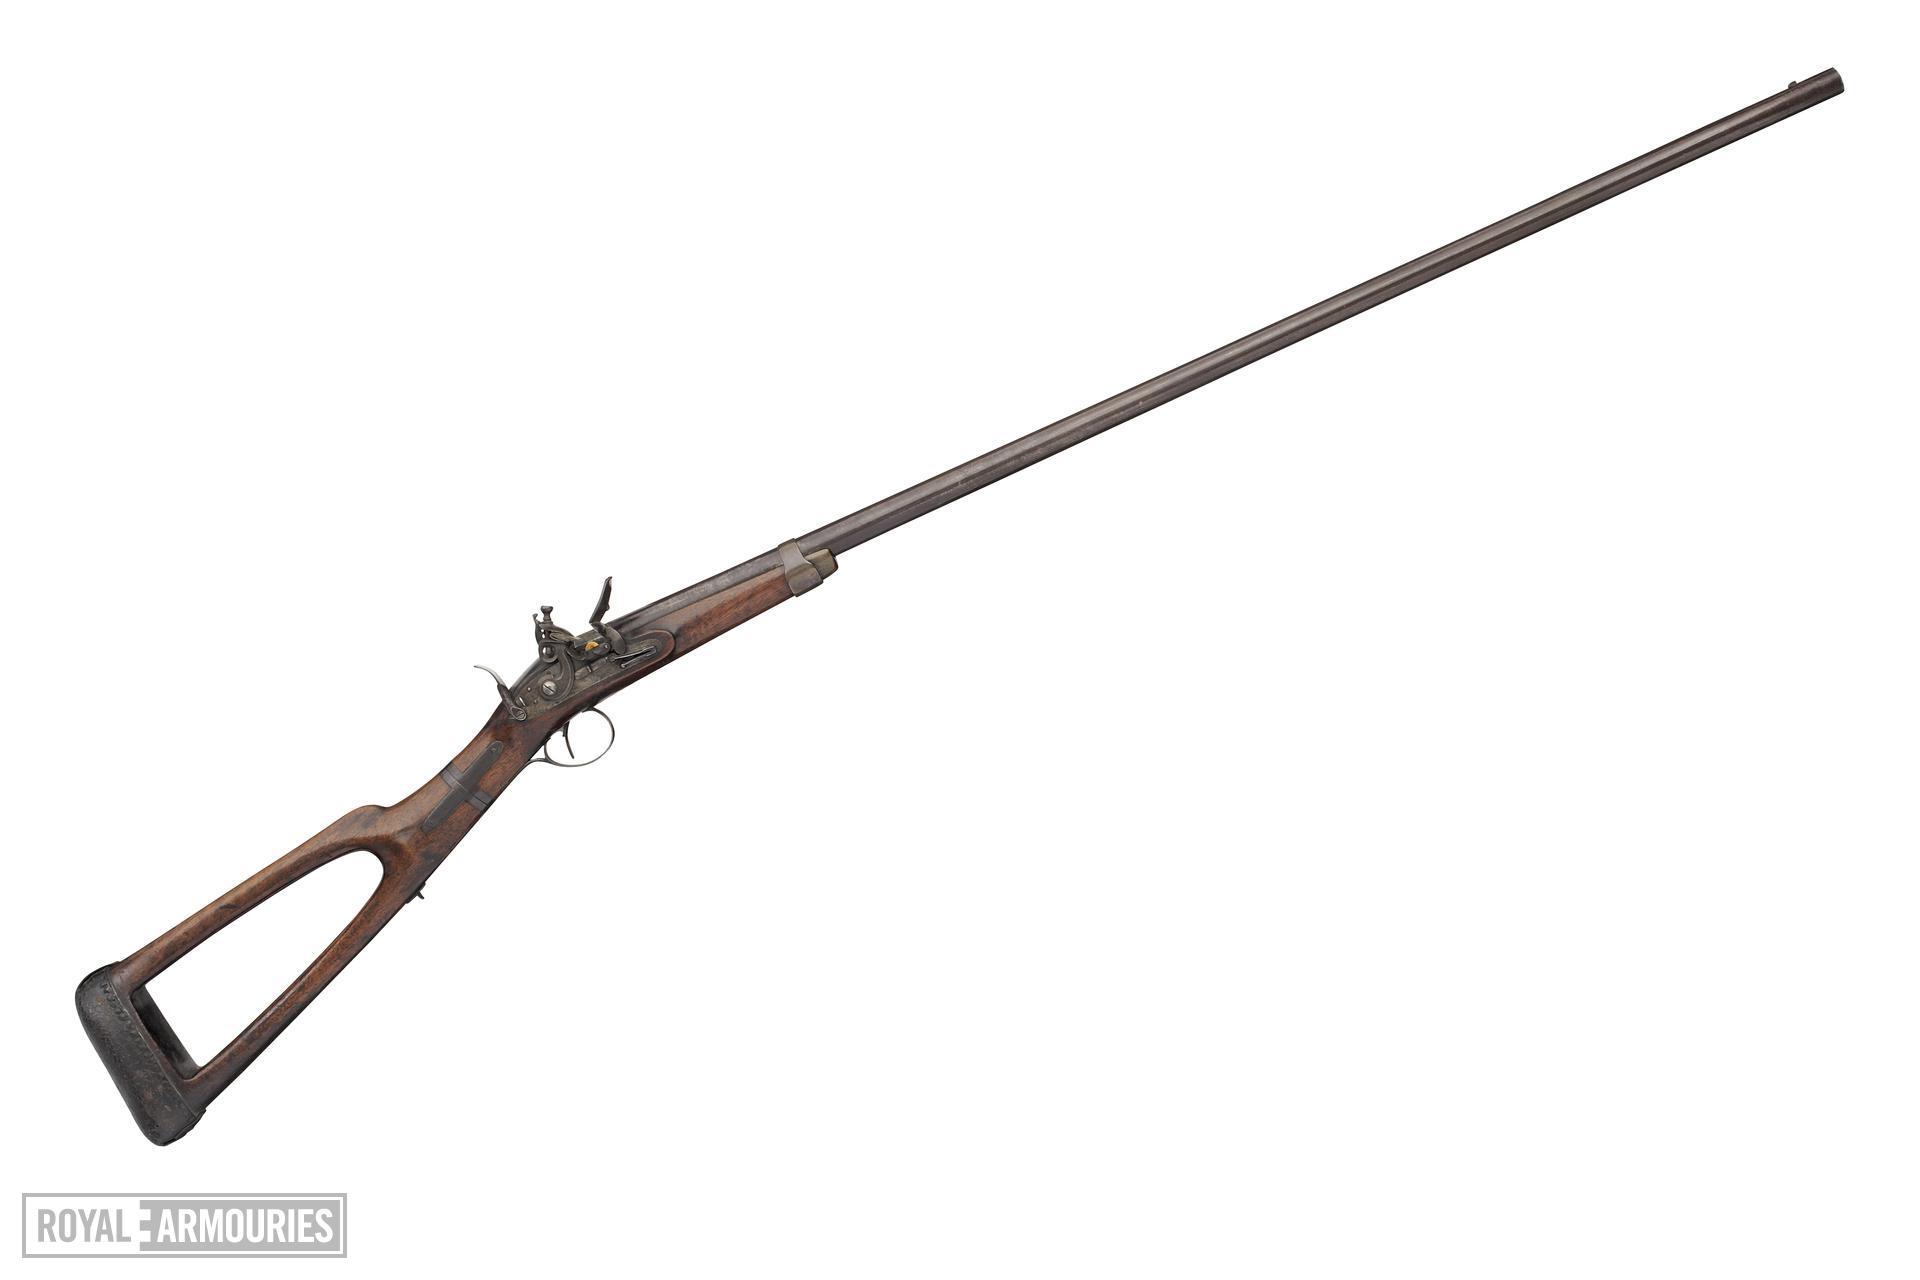 Flintlock gun - By John Barton Take-down design